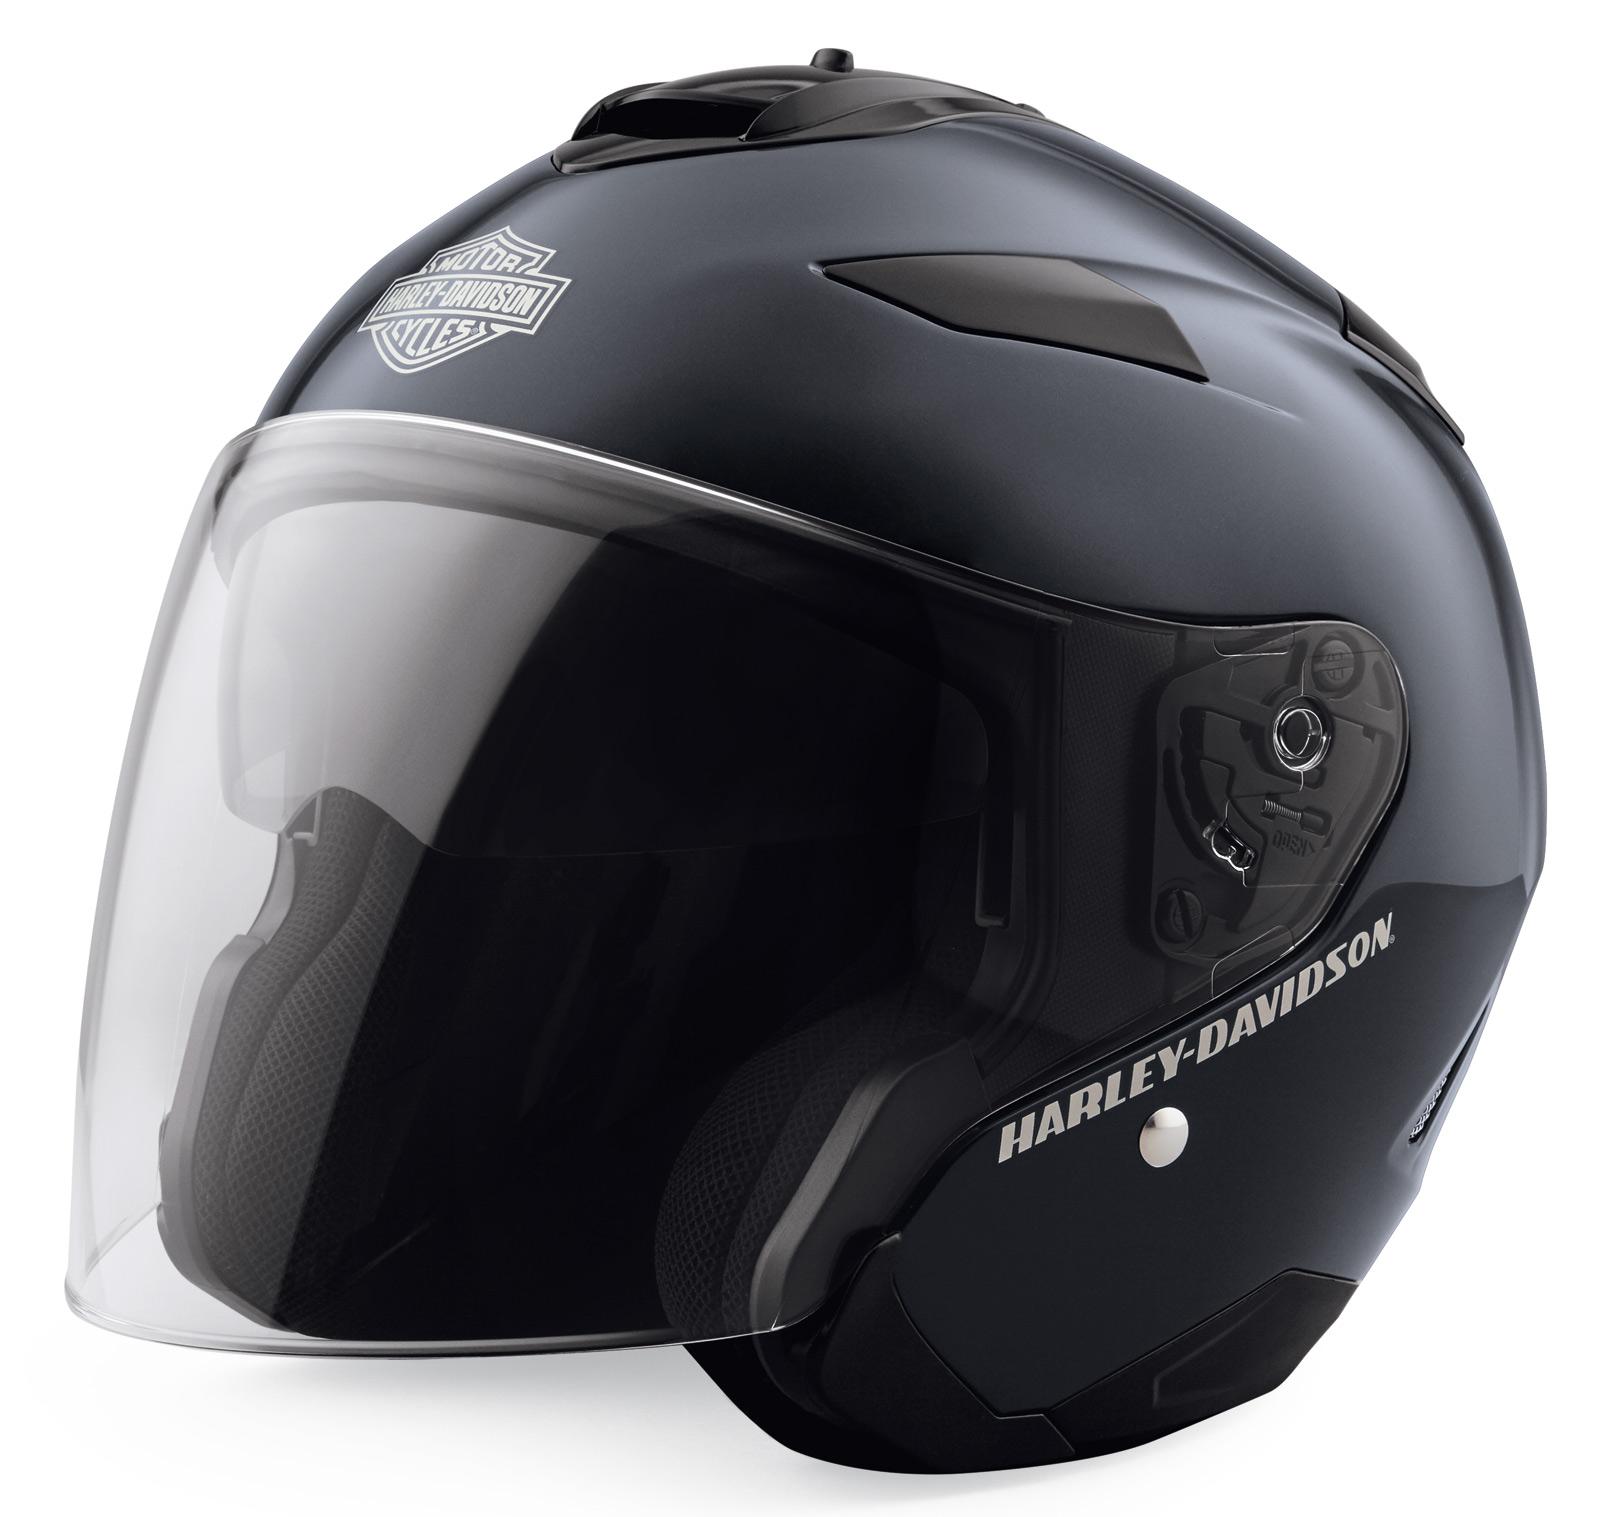 2ade095df 98361-19EX Harley-Davidson 3/4 Helmet Maywood H27 at Thunderbike Shop